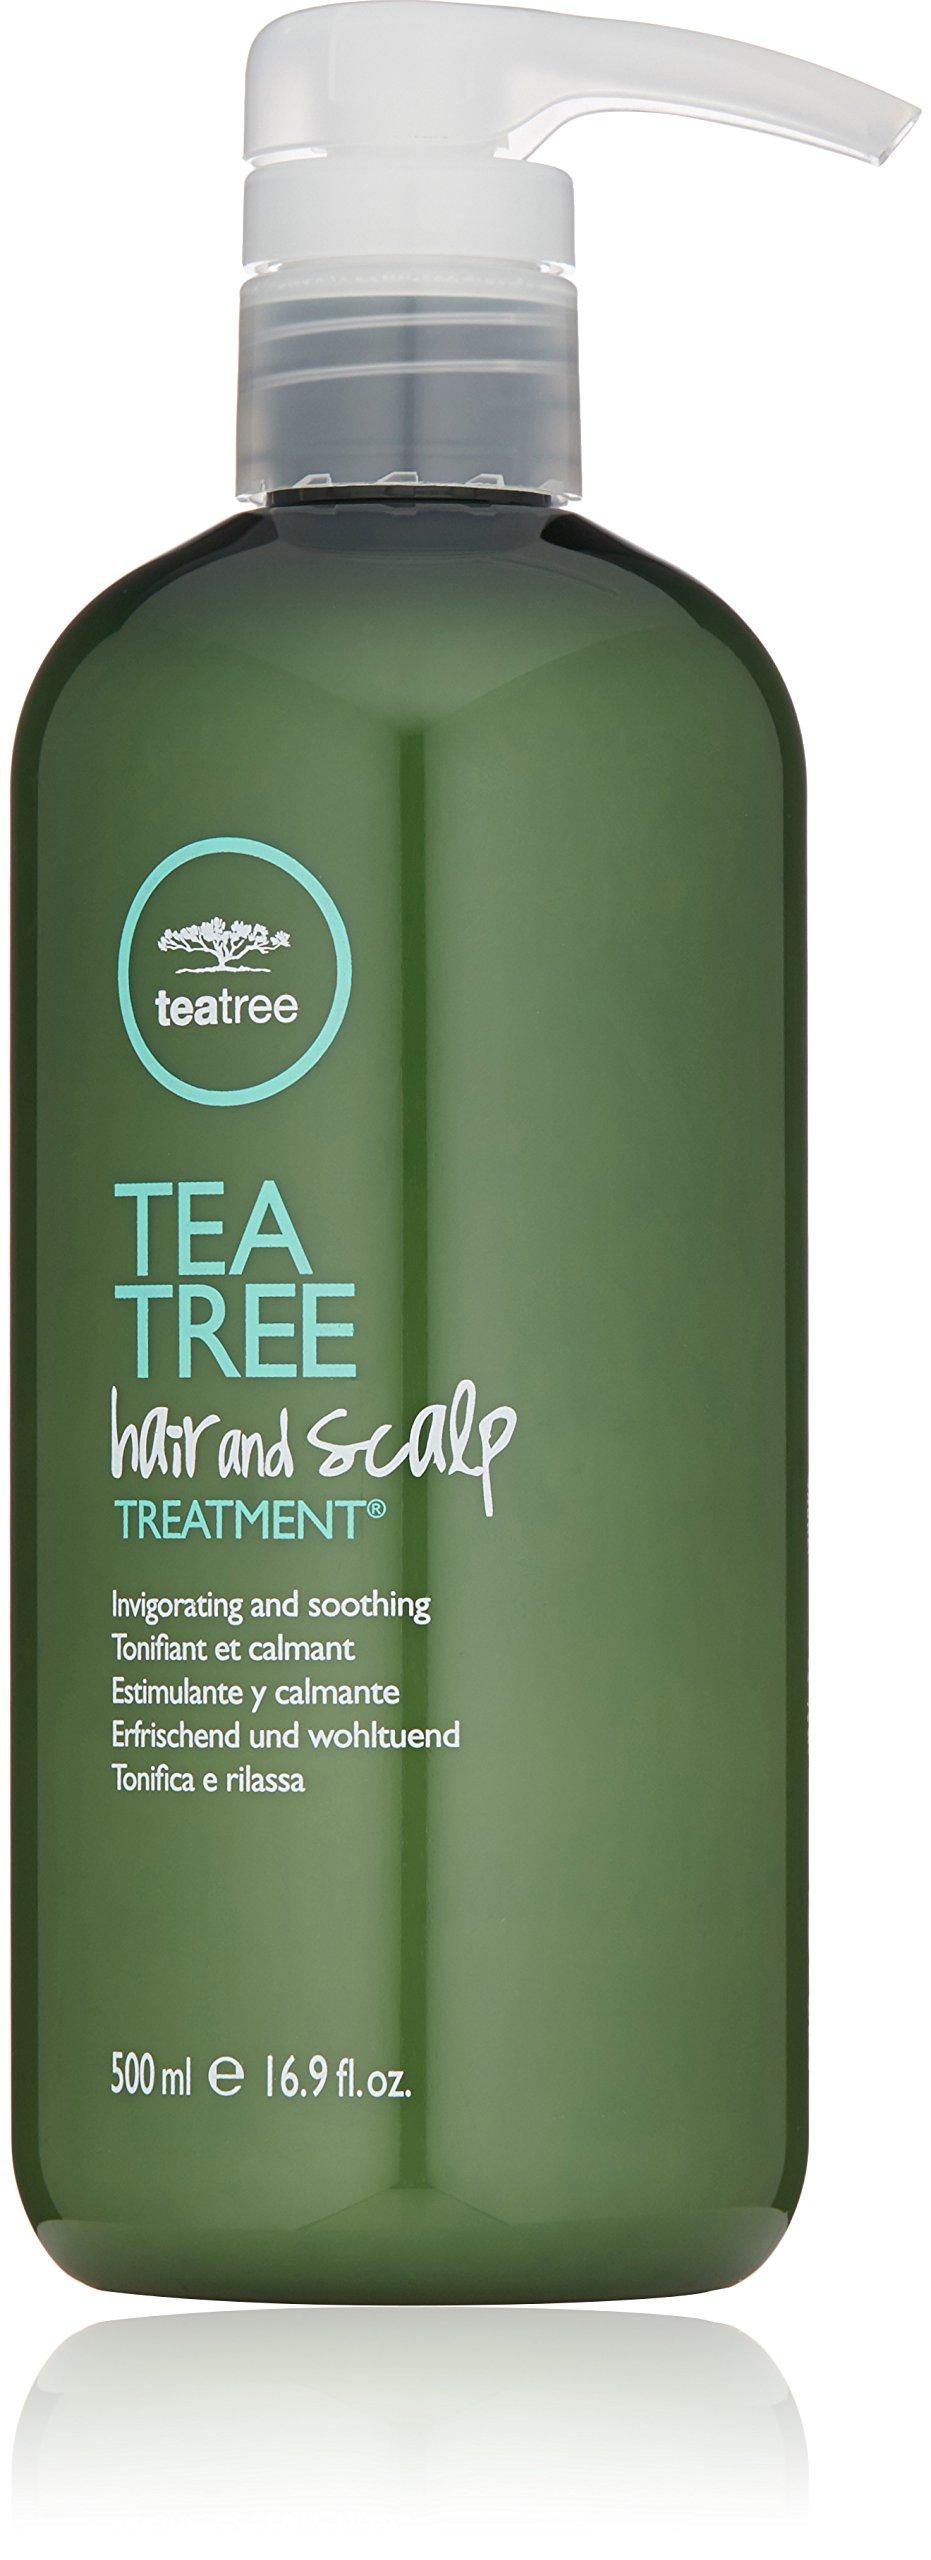 Tea Tree Hair and Scalp Treatment, 16.9 Fl Oz